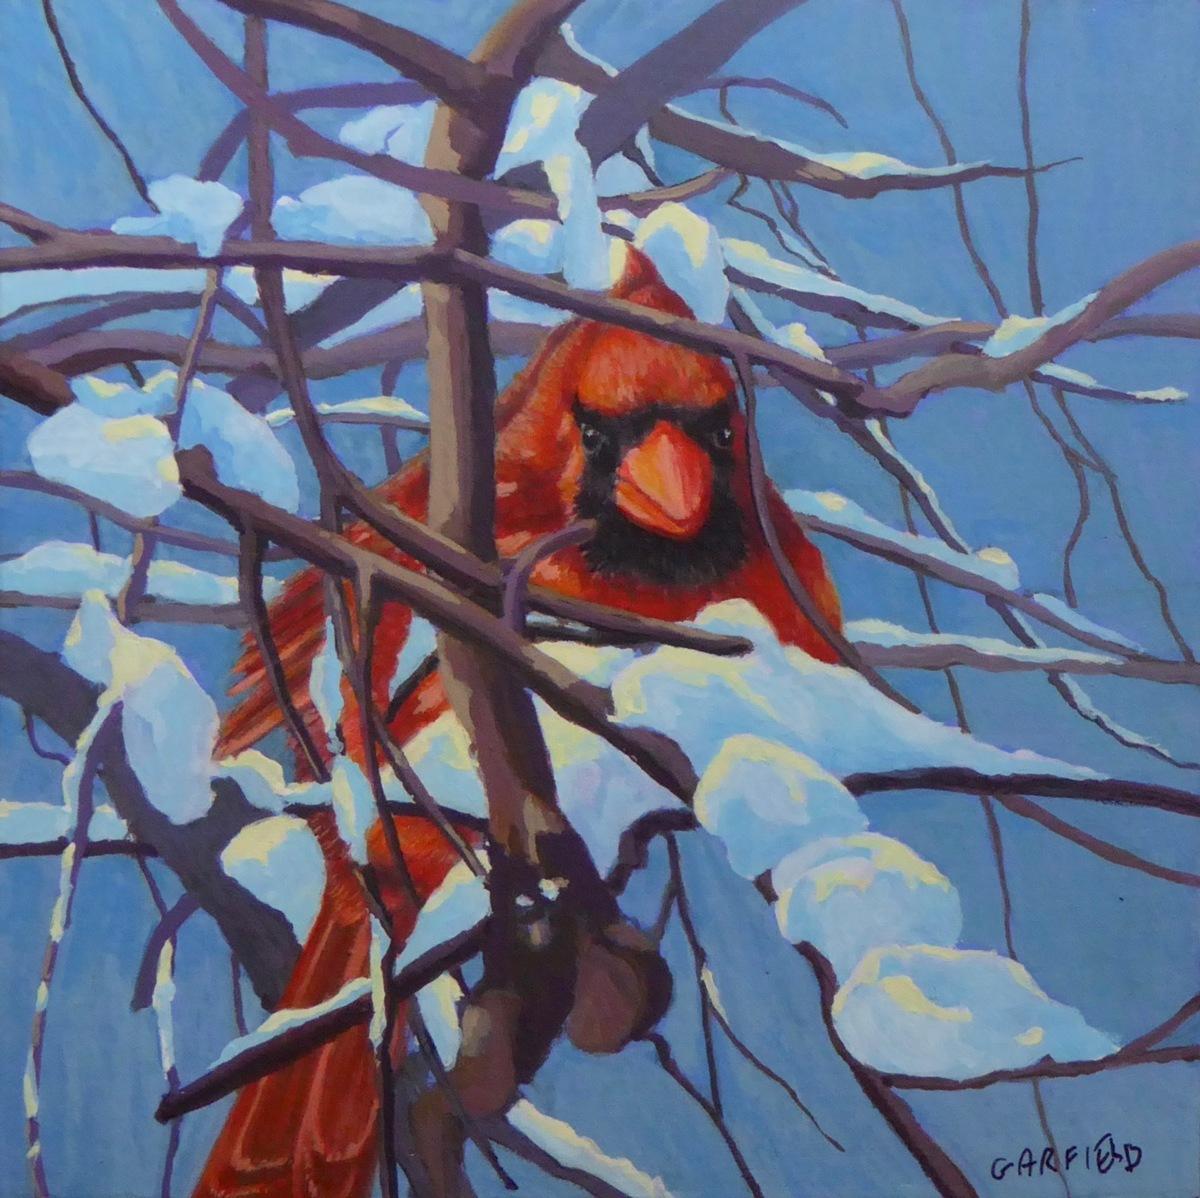 A Cardinal after the Snowfall (large view)